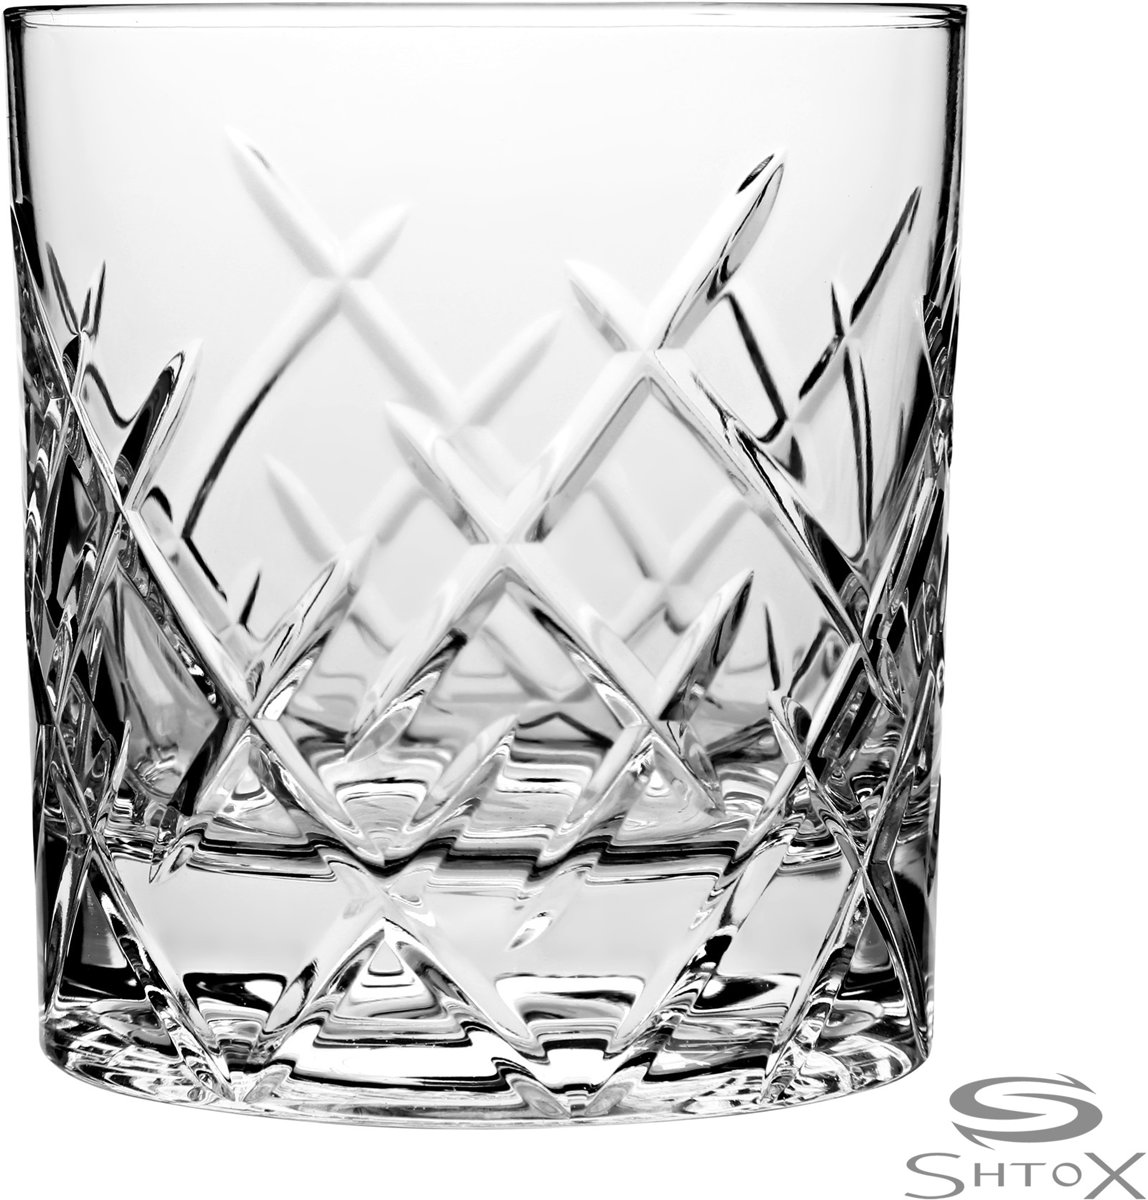 Shtox 011 Roterend Whiskey en cocktail glas uit kristal kopen